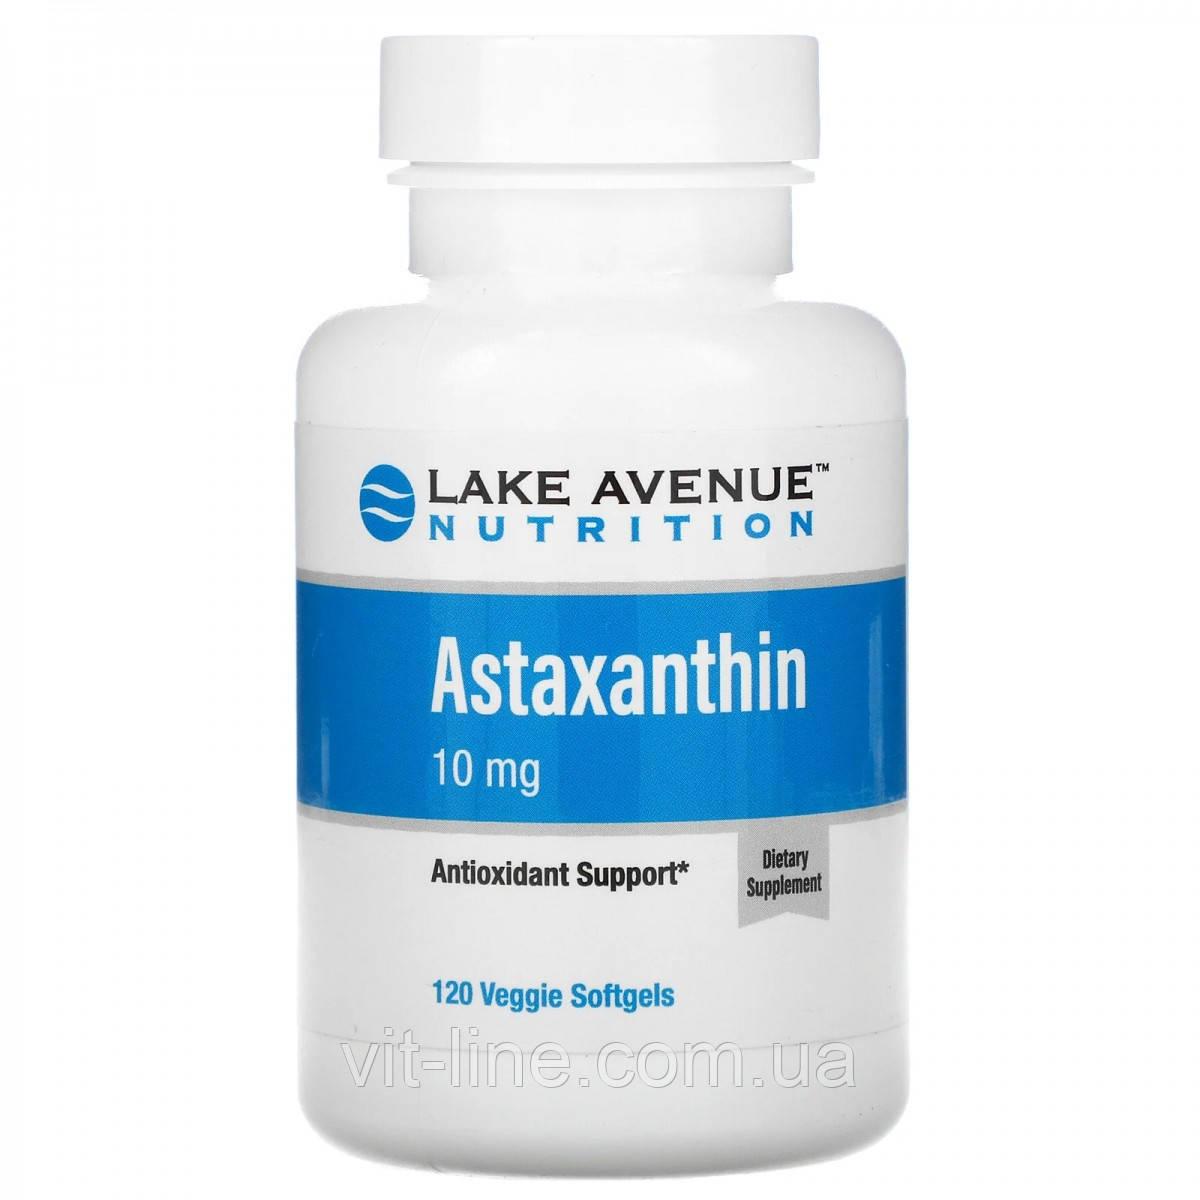 Lake Avenue Nutrition, астаксантин, 10 мг, 120 вегетарианских капсул